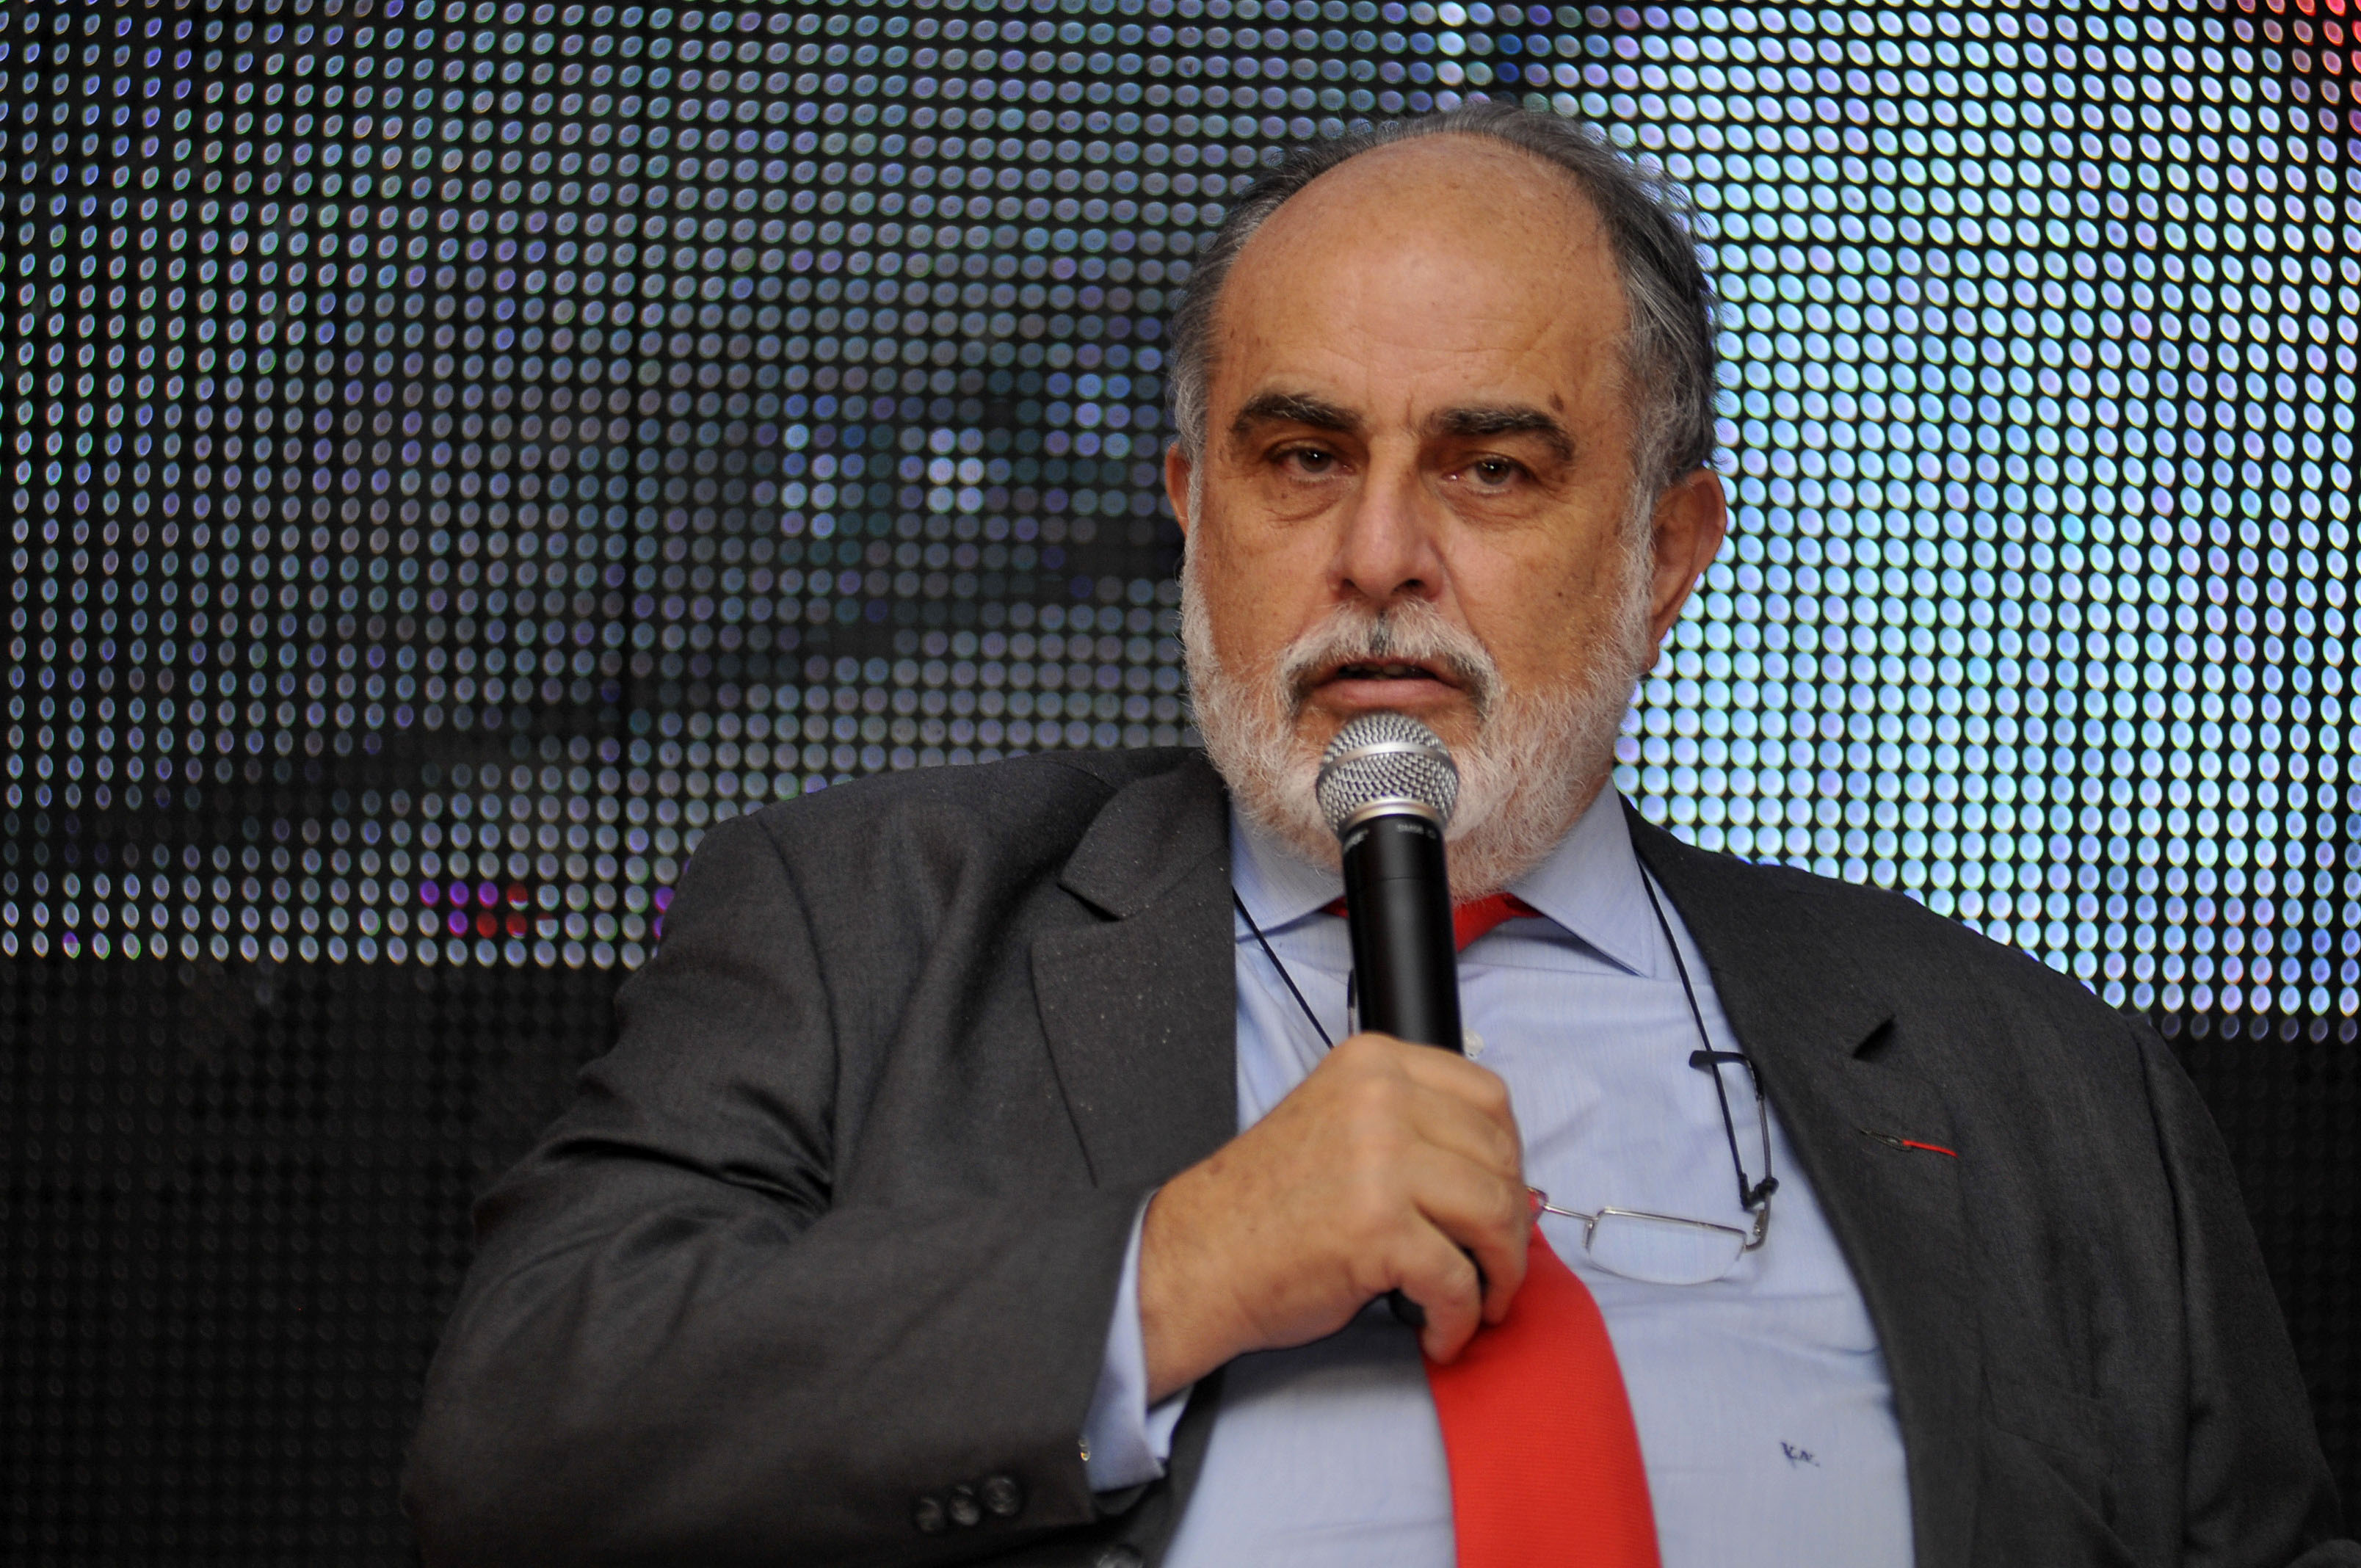 Le président exécutif de Djezzy, Vincezo Nesci. New Press